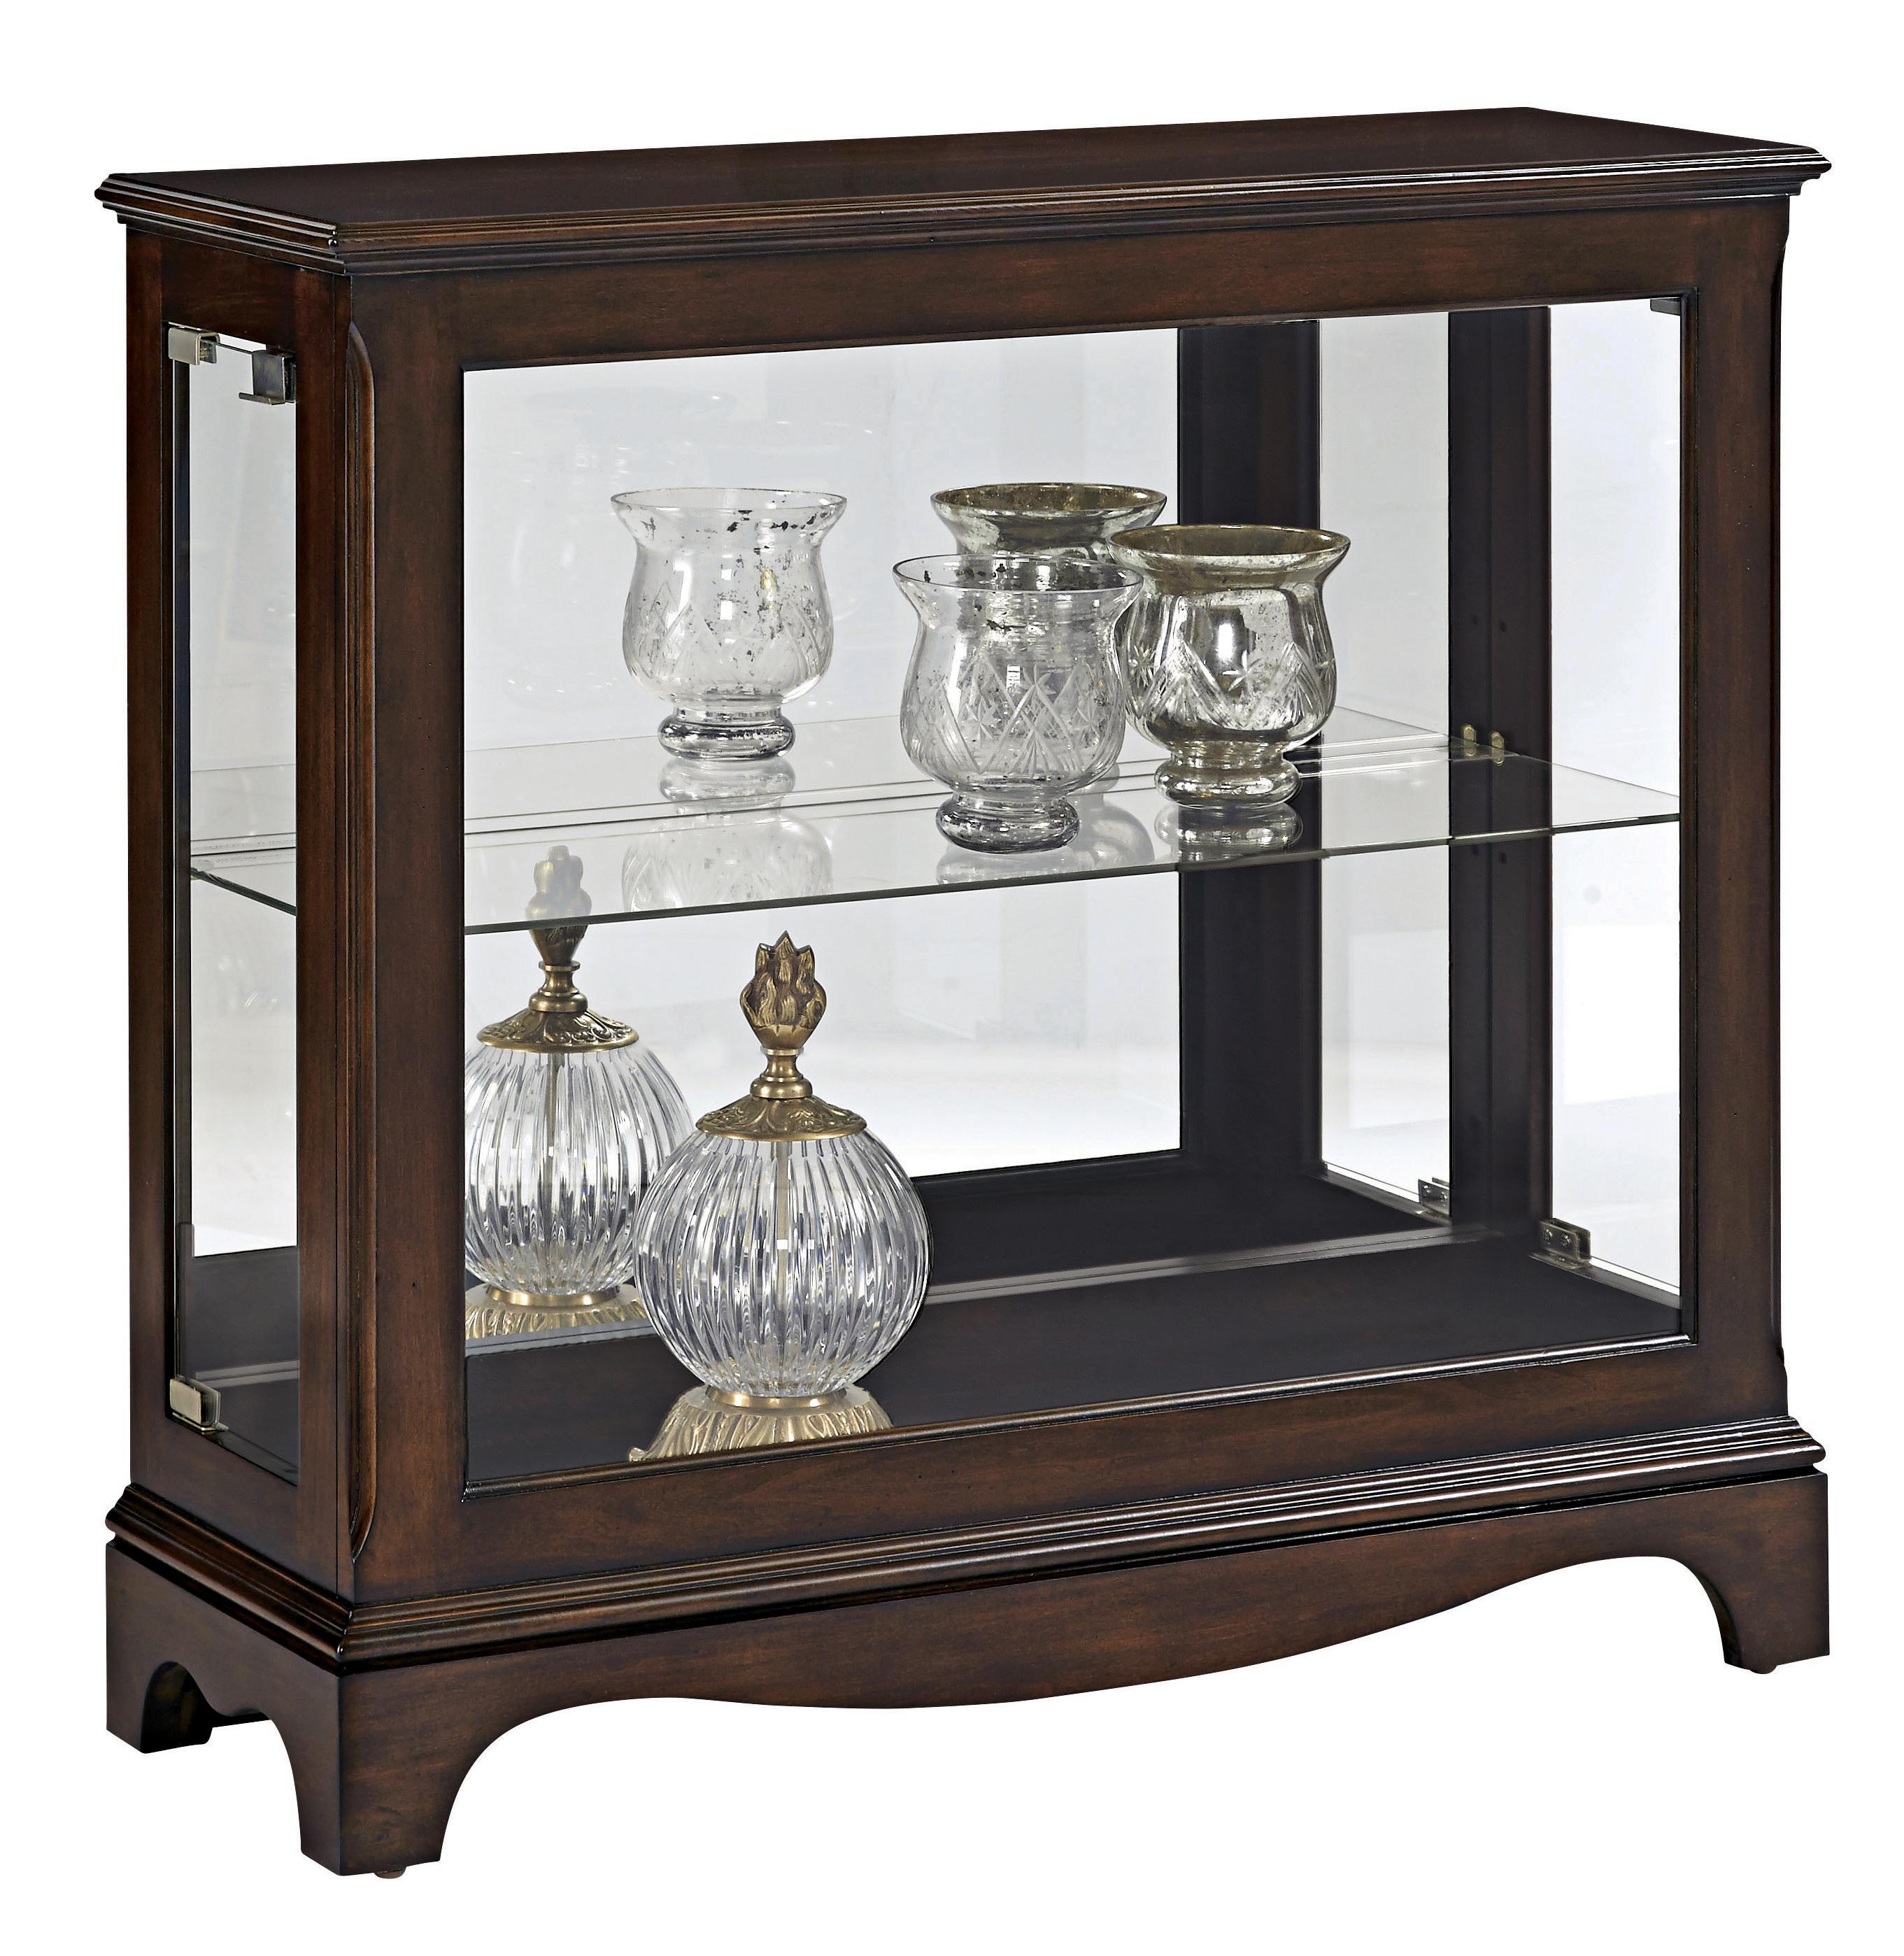 Pulaski Furniture Curios Console - Item Number: 21494